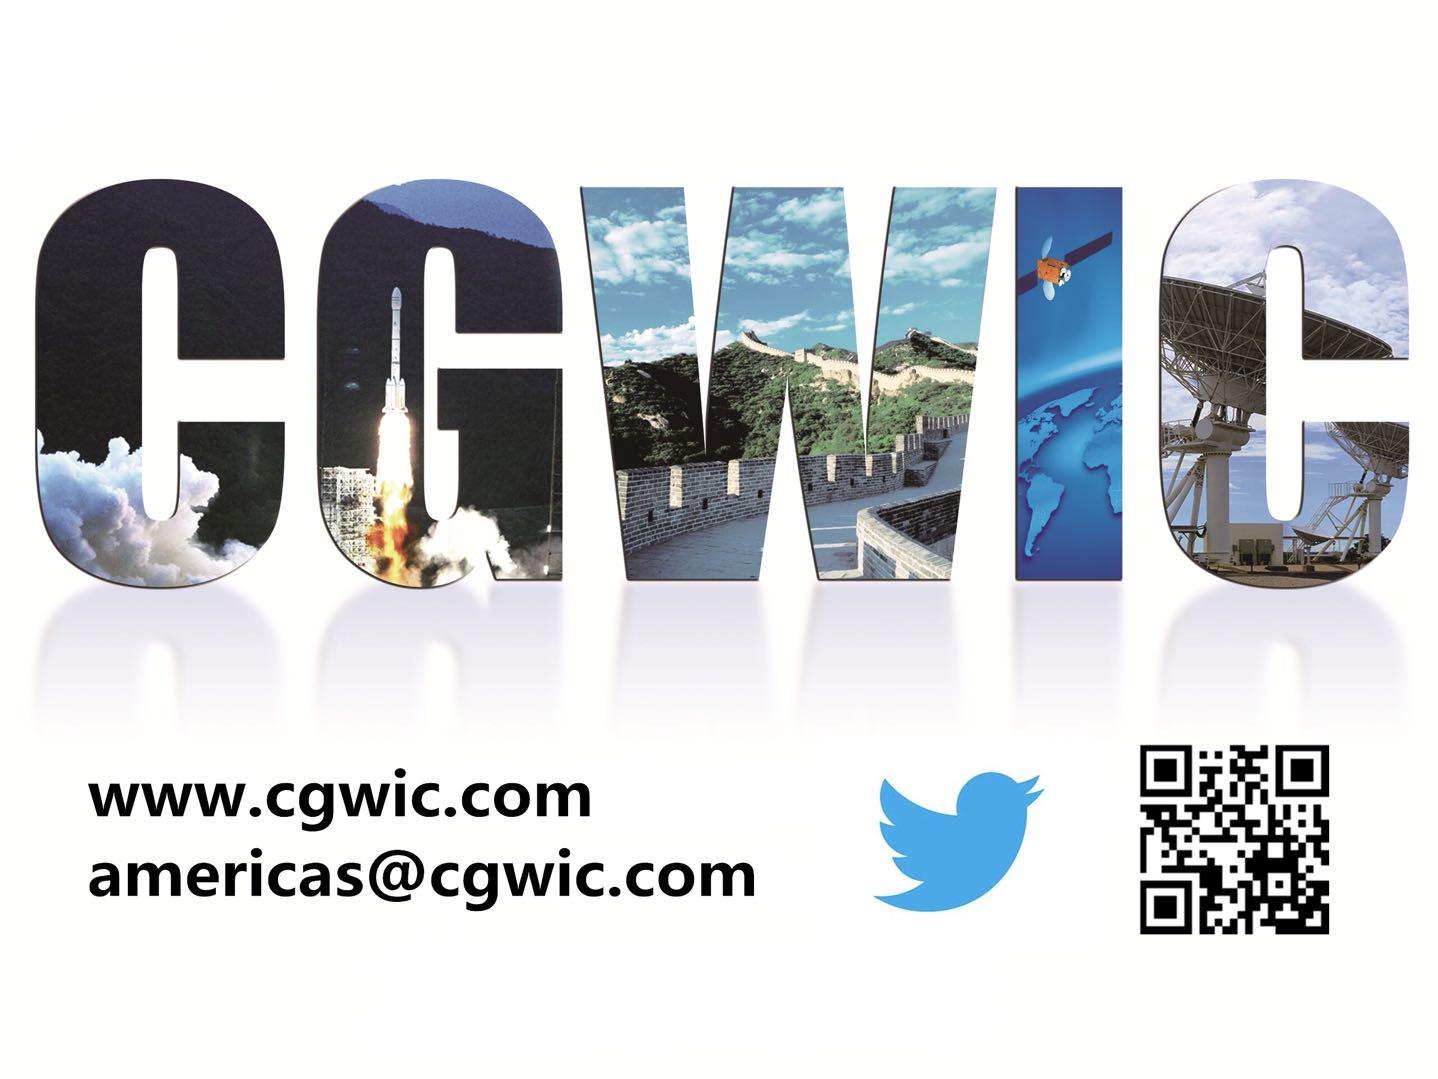 CGWIC-FOTOGRAFÍA.jpg